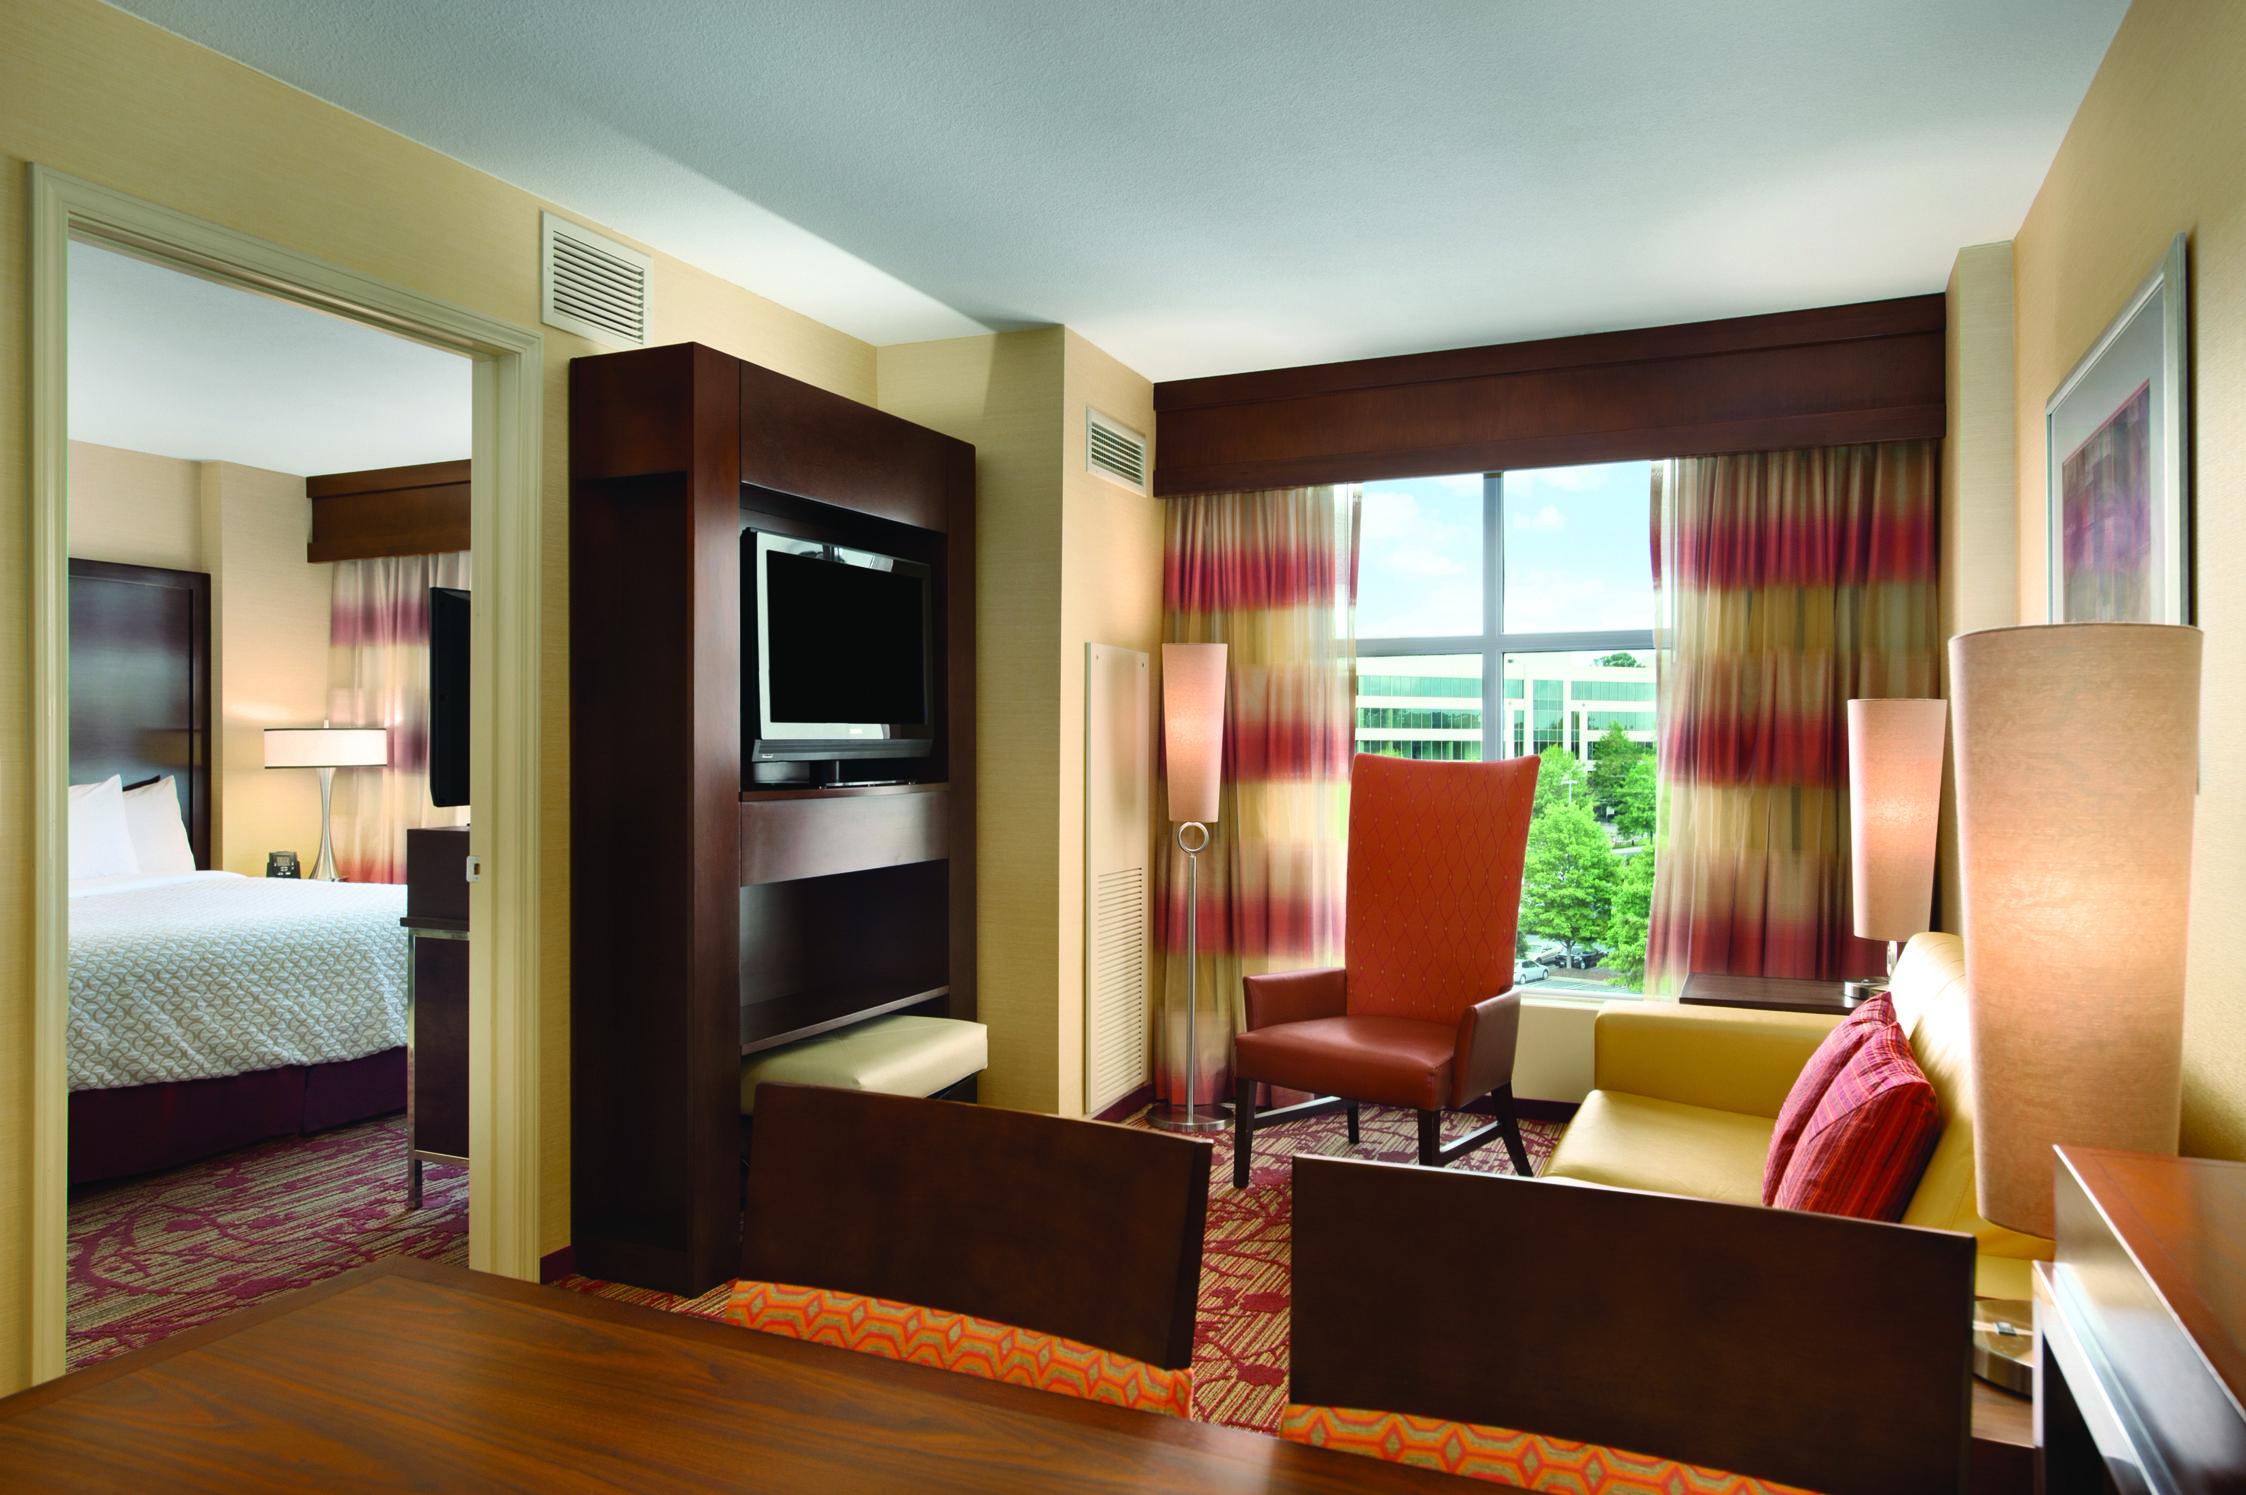 Embassy Suites Kennesaw, GA Embassy suites, Suites